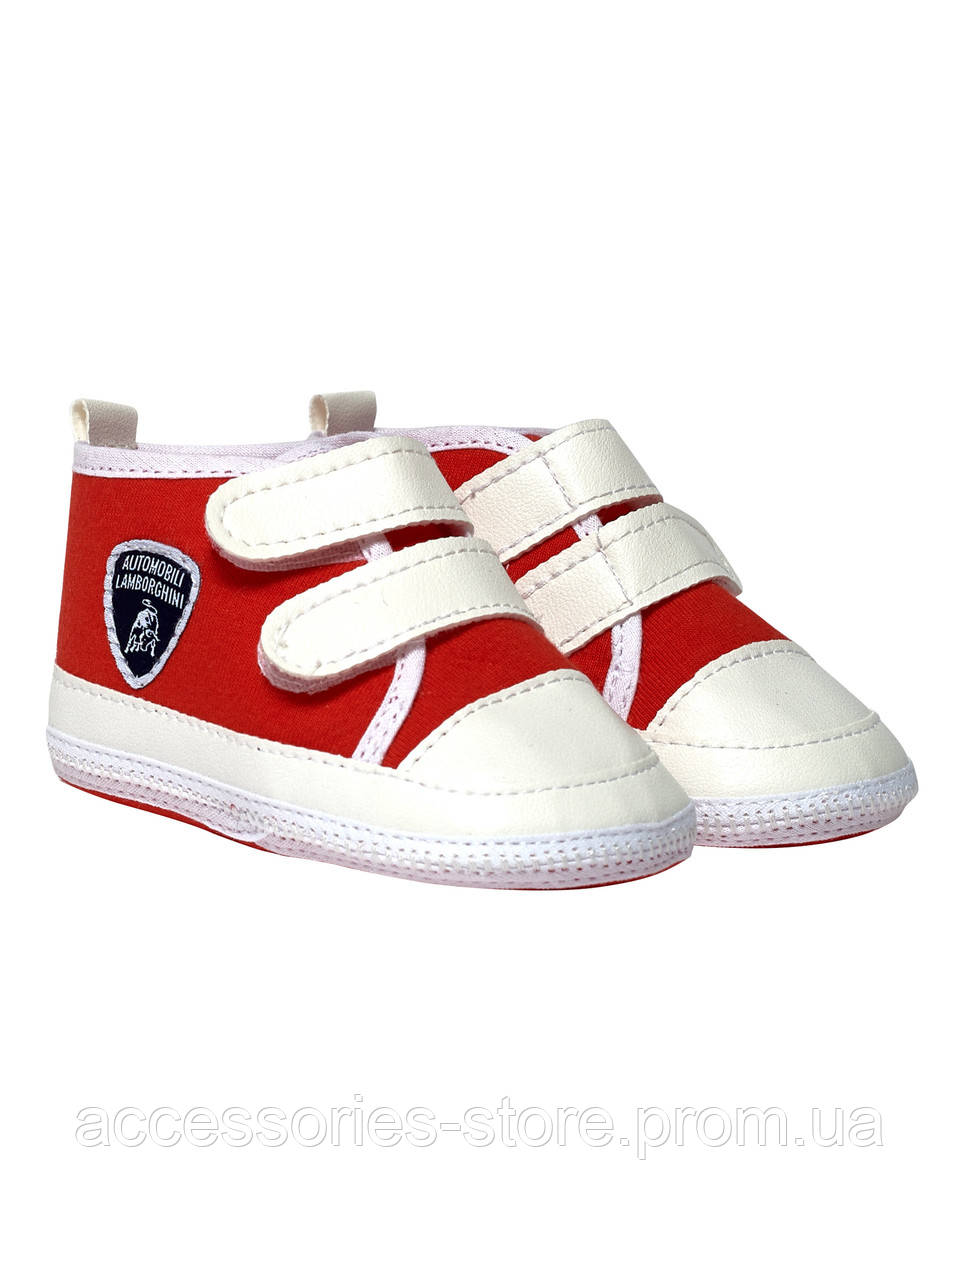 Обувь для детей Lamborghini Shield rip-tape strap shoes, white/red